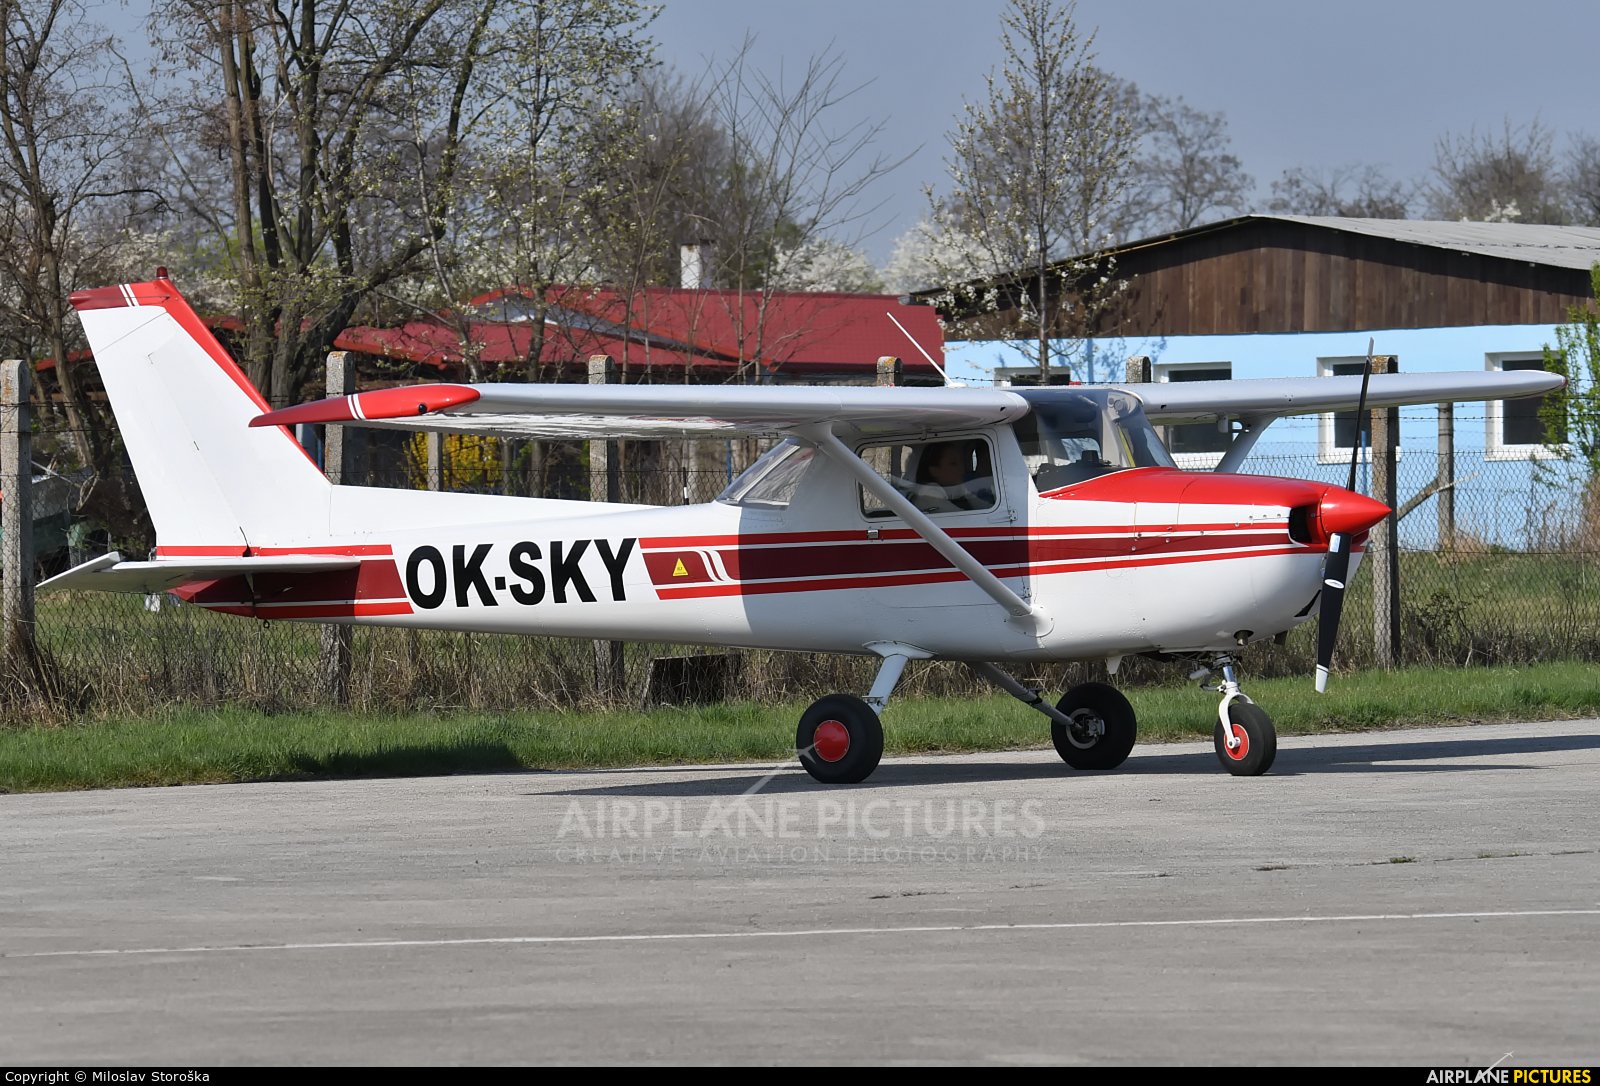 Blue Sky Service OK-SKY aircraft at Trnava- Boleráz